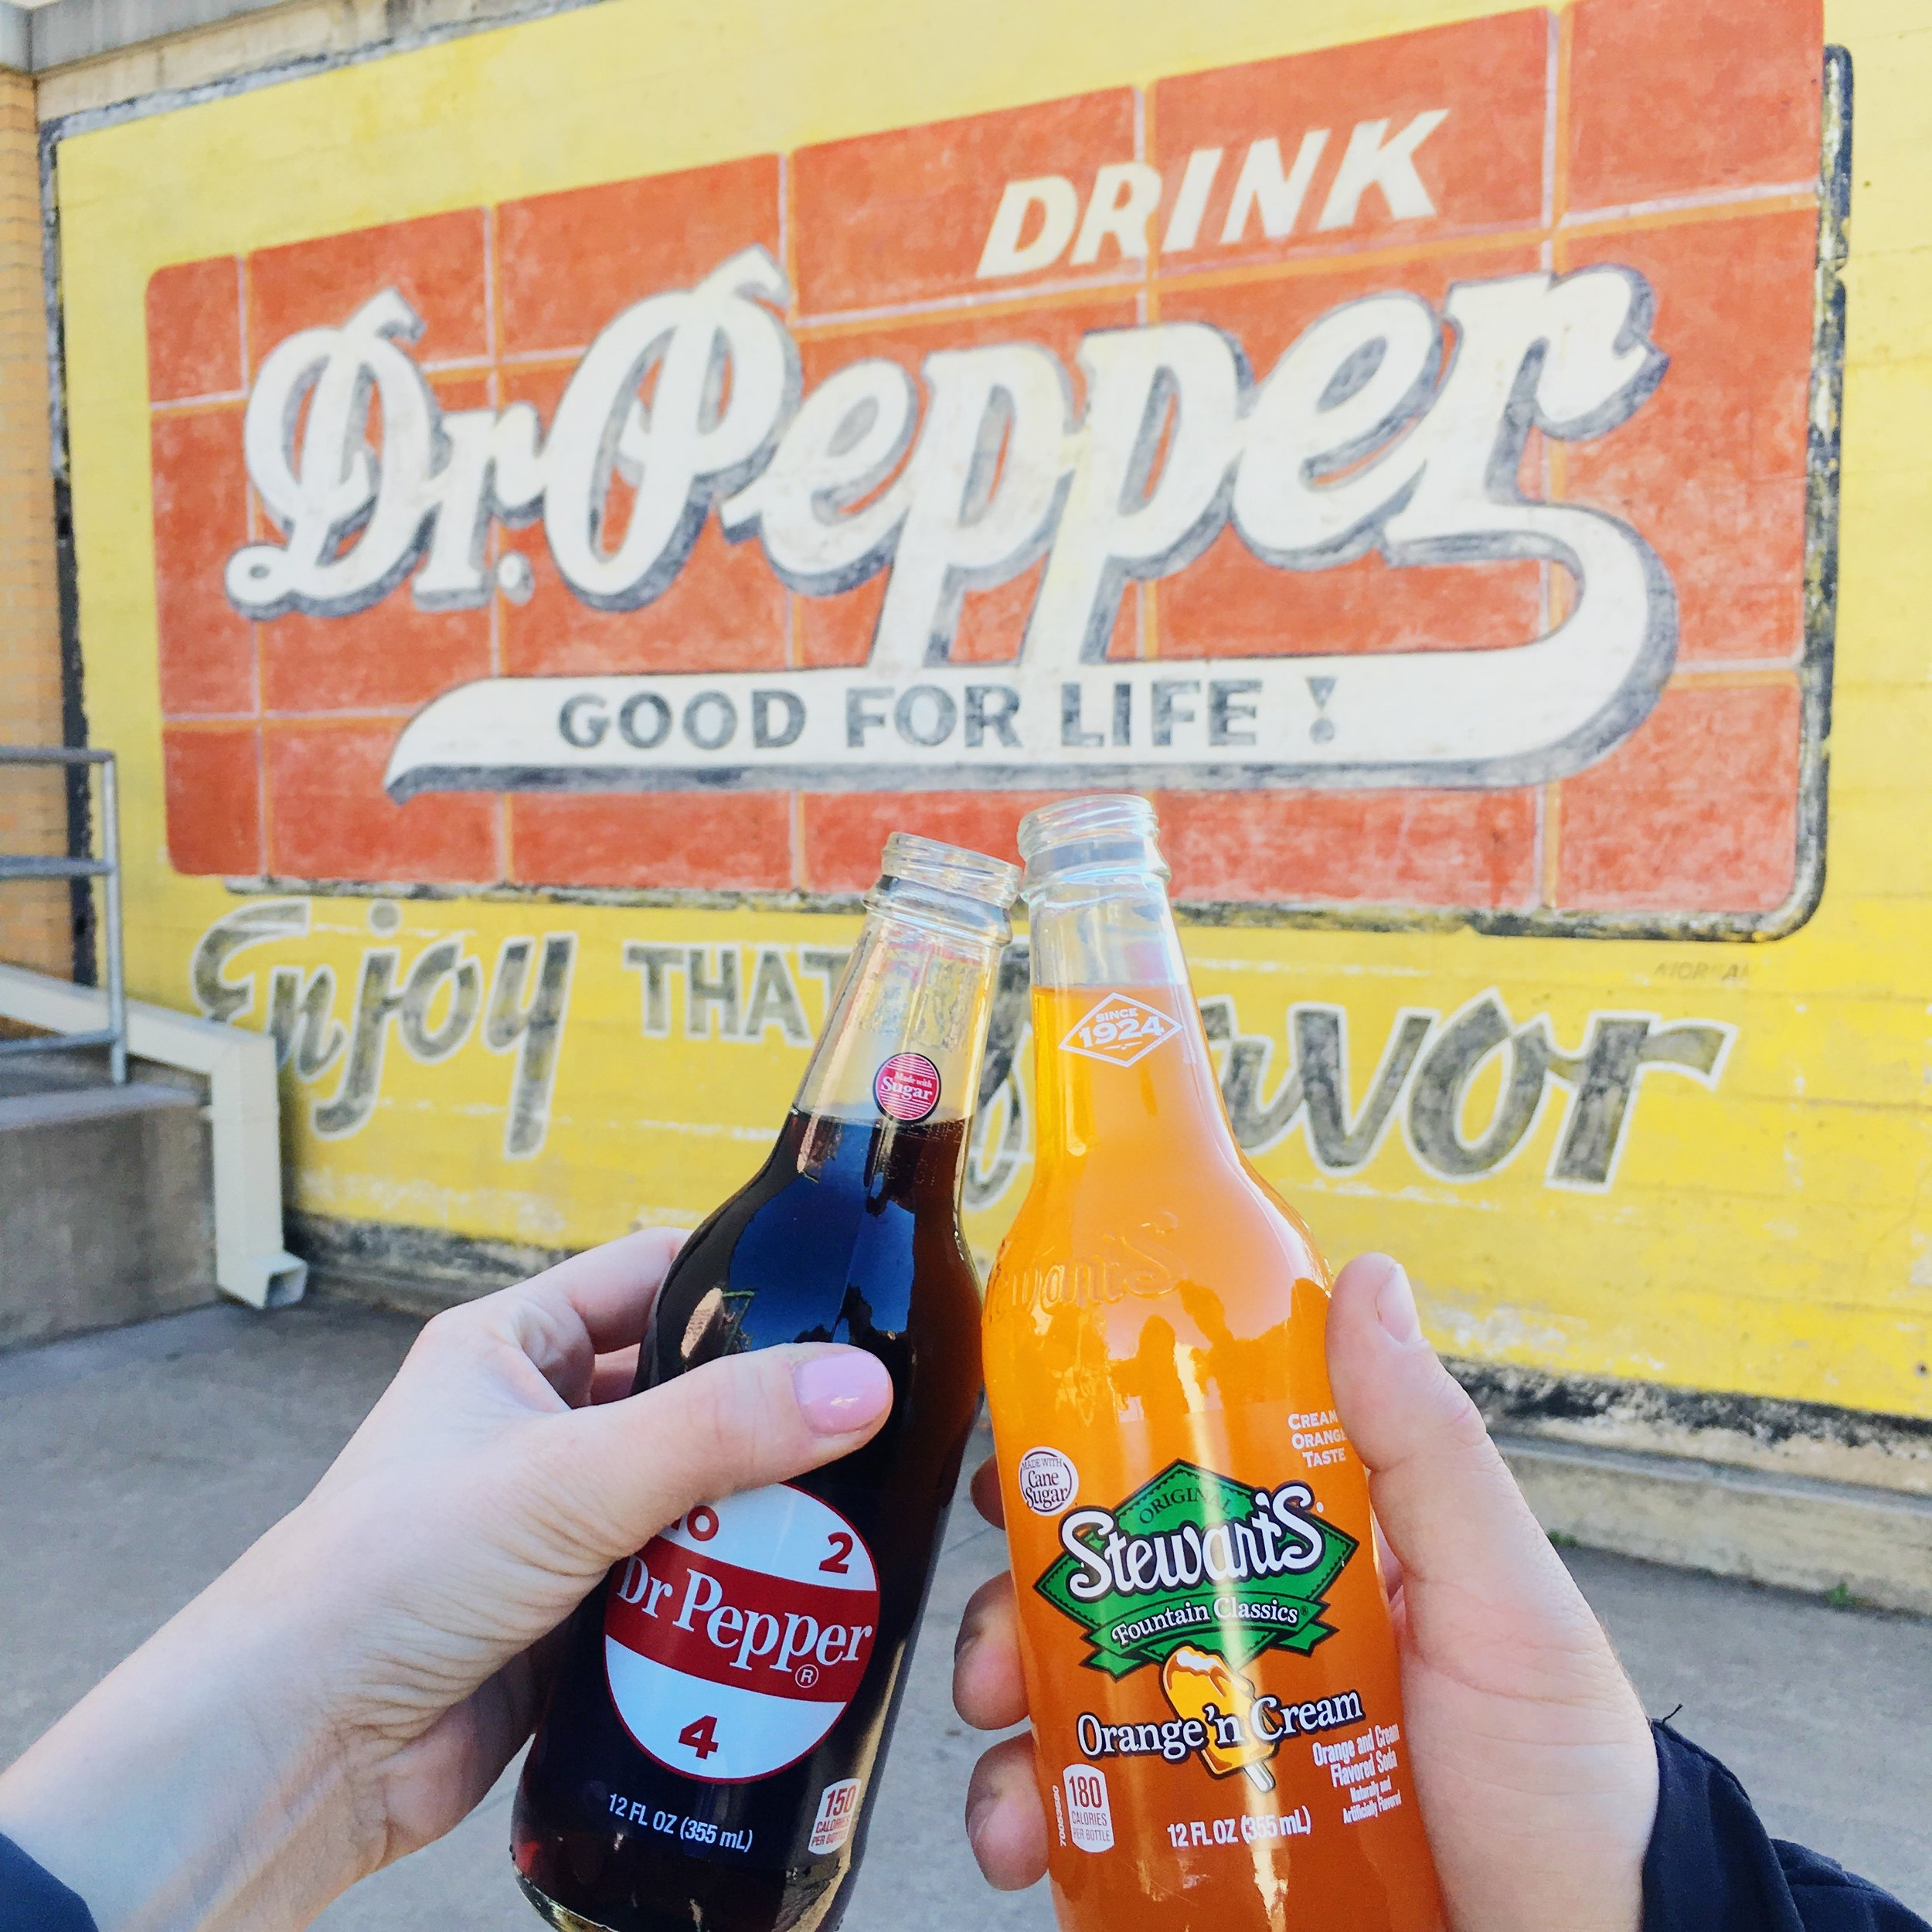 Dr Pepper Musuem - Things to do in Waco, Texas - Wander Dust Blog  (3).JPG